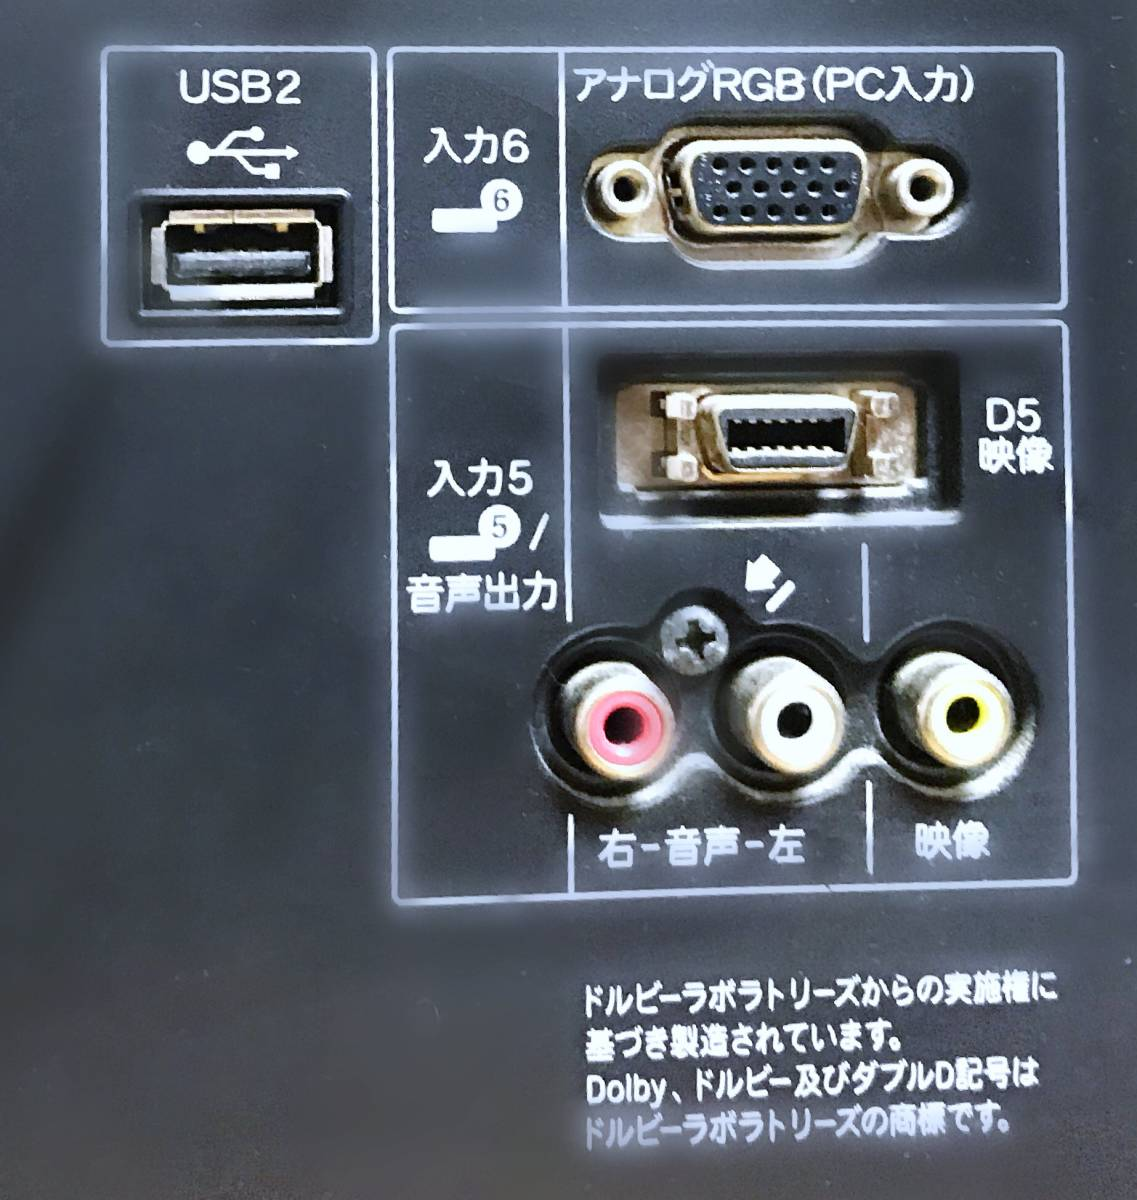 【LC-46G7☆画面分割/3D☆超美品】SHARP☆LED 3D AQUOS☆デジタル フルハイビジョン液晶T.V☆22型☆外付けHDD☆完動品!_画像9